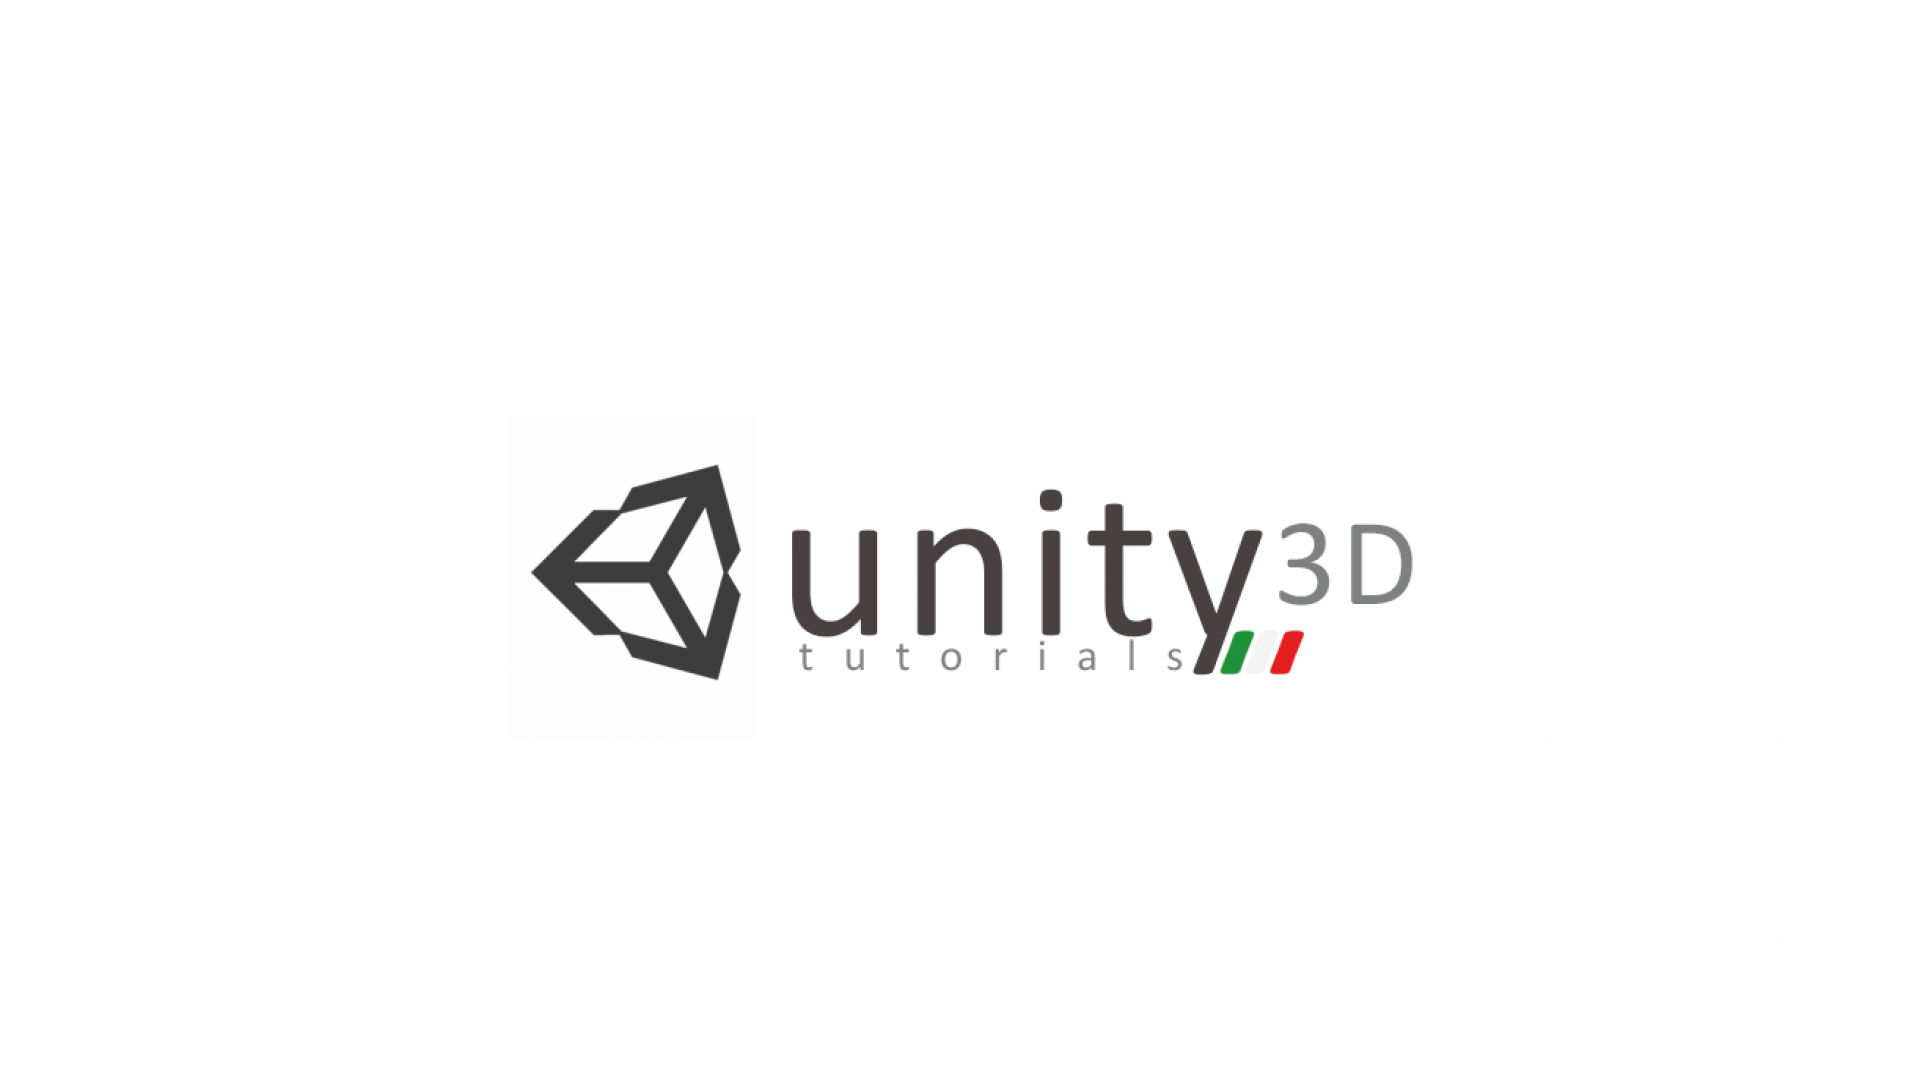 Unity 3D Italia